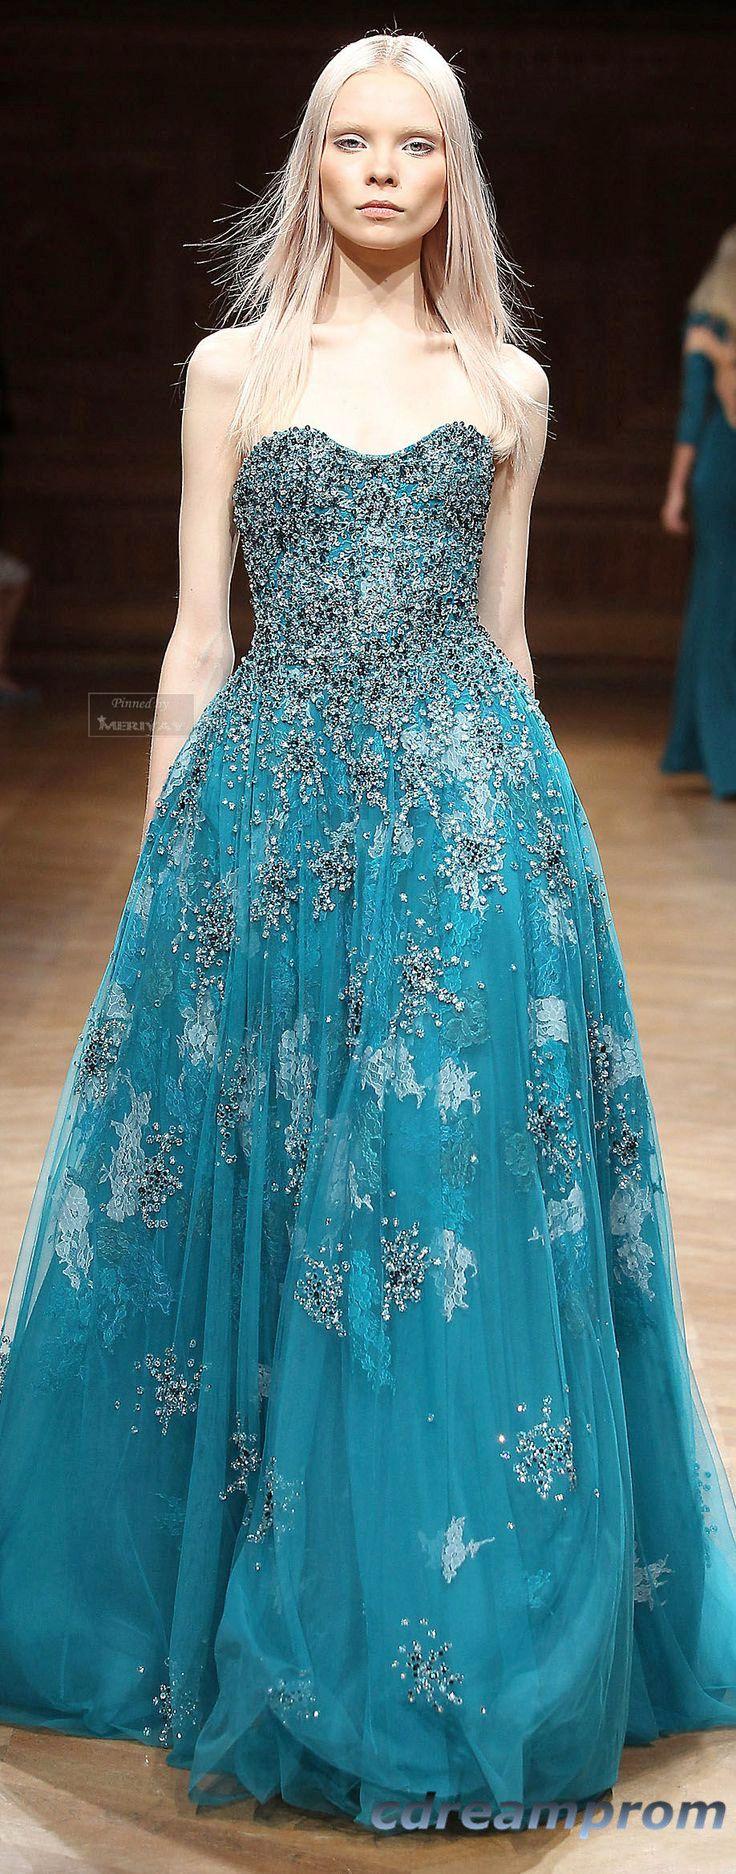 7 best Prom Dresses images on Pinterest   Prom dresses, Dress prom ...